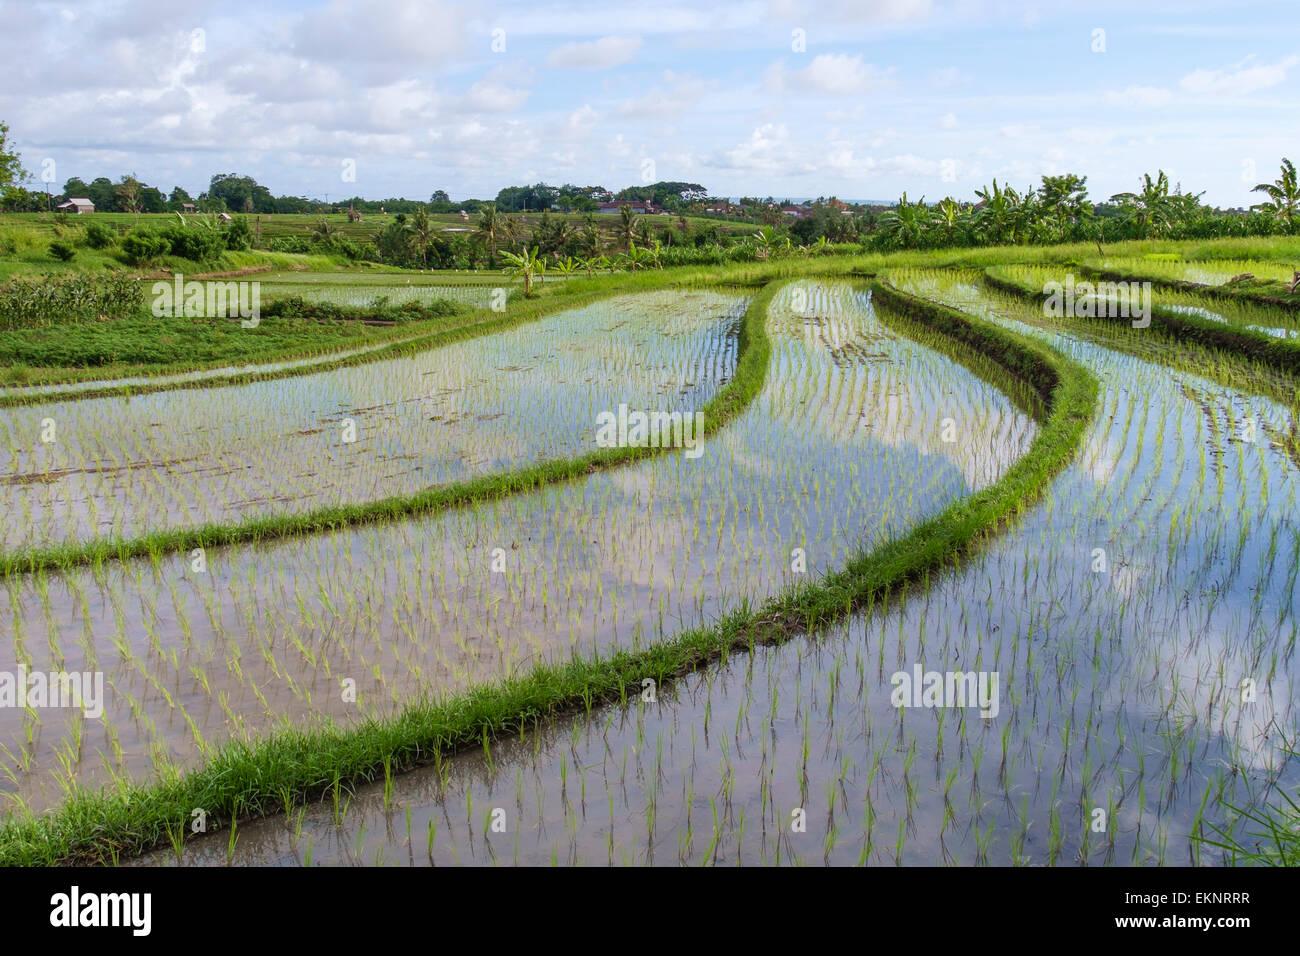 Rice field, Canggu, Bali, Indonesia - Stock Image